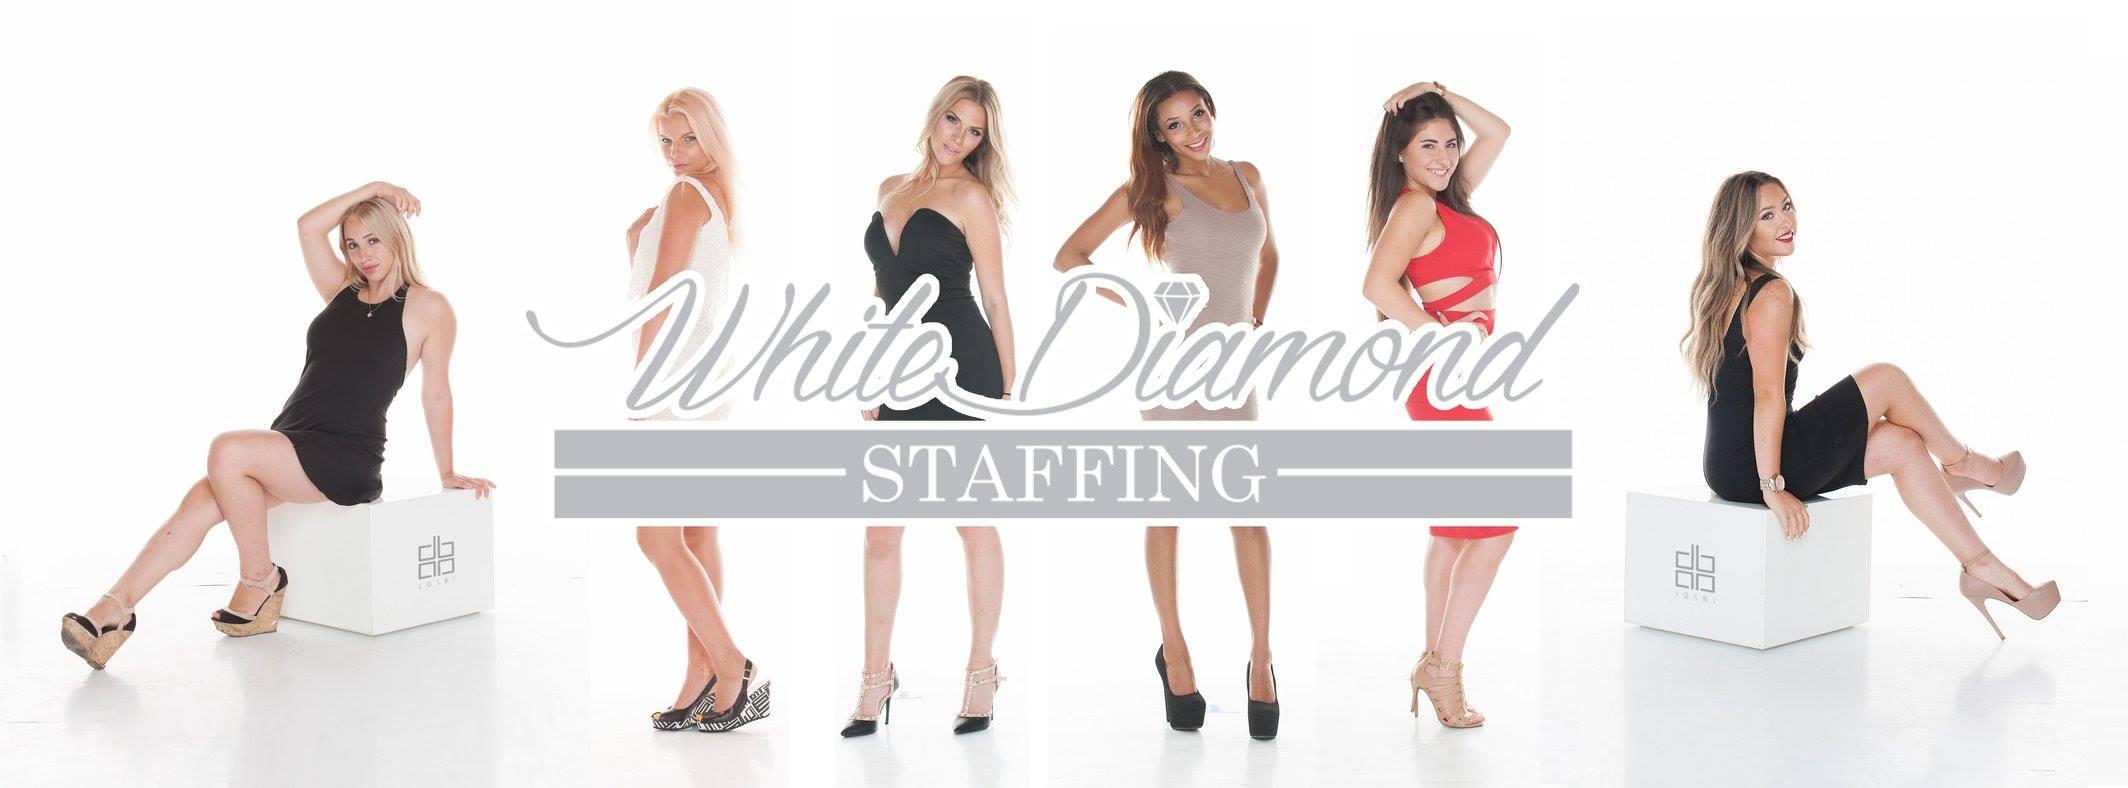 Model: White Diamond